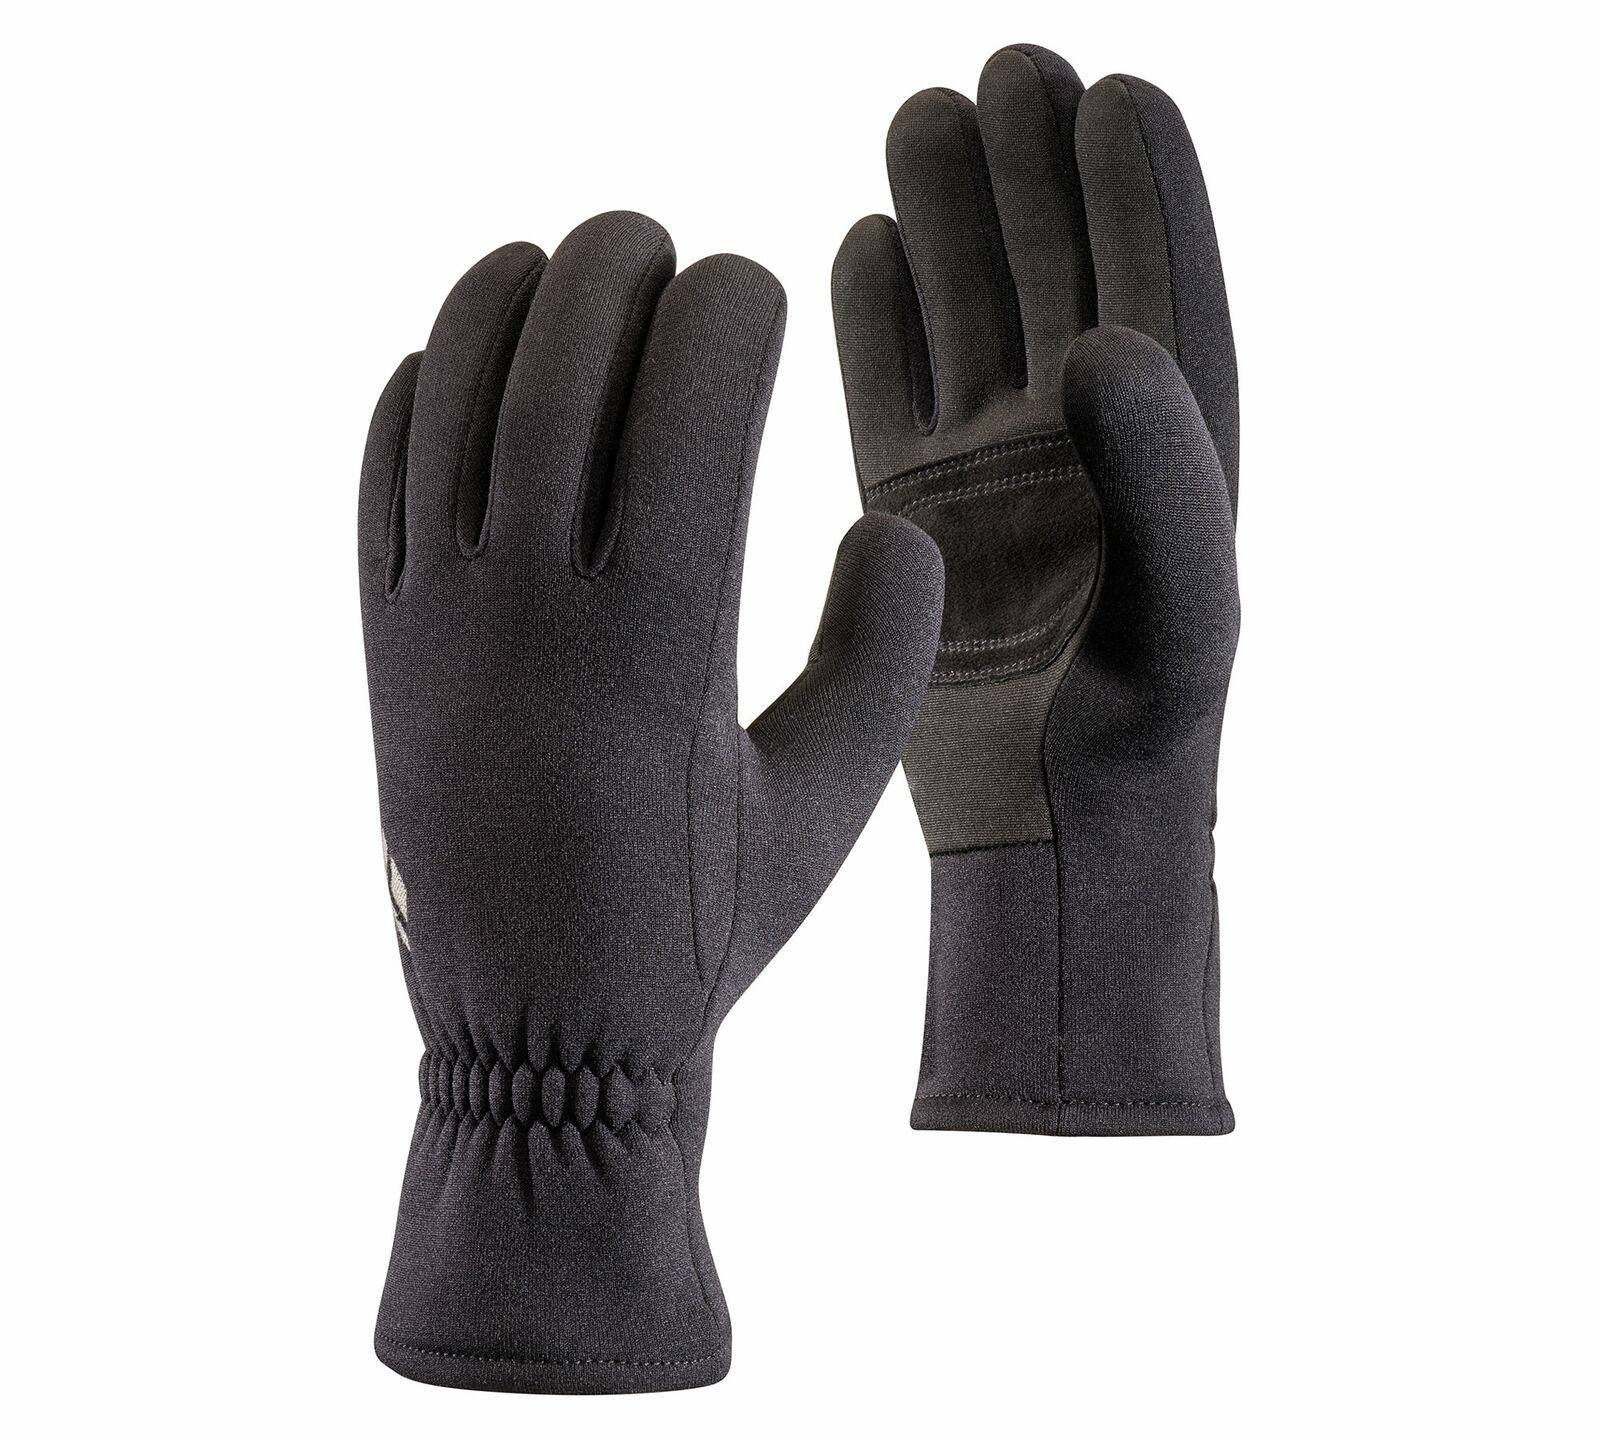 BLACK DIAMOND Midweight Screentap Gloves - XL - Black